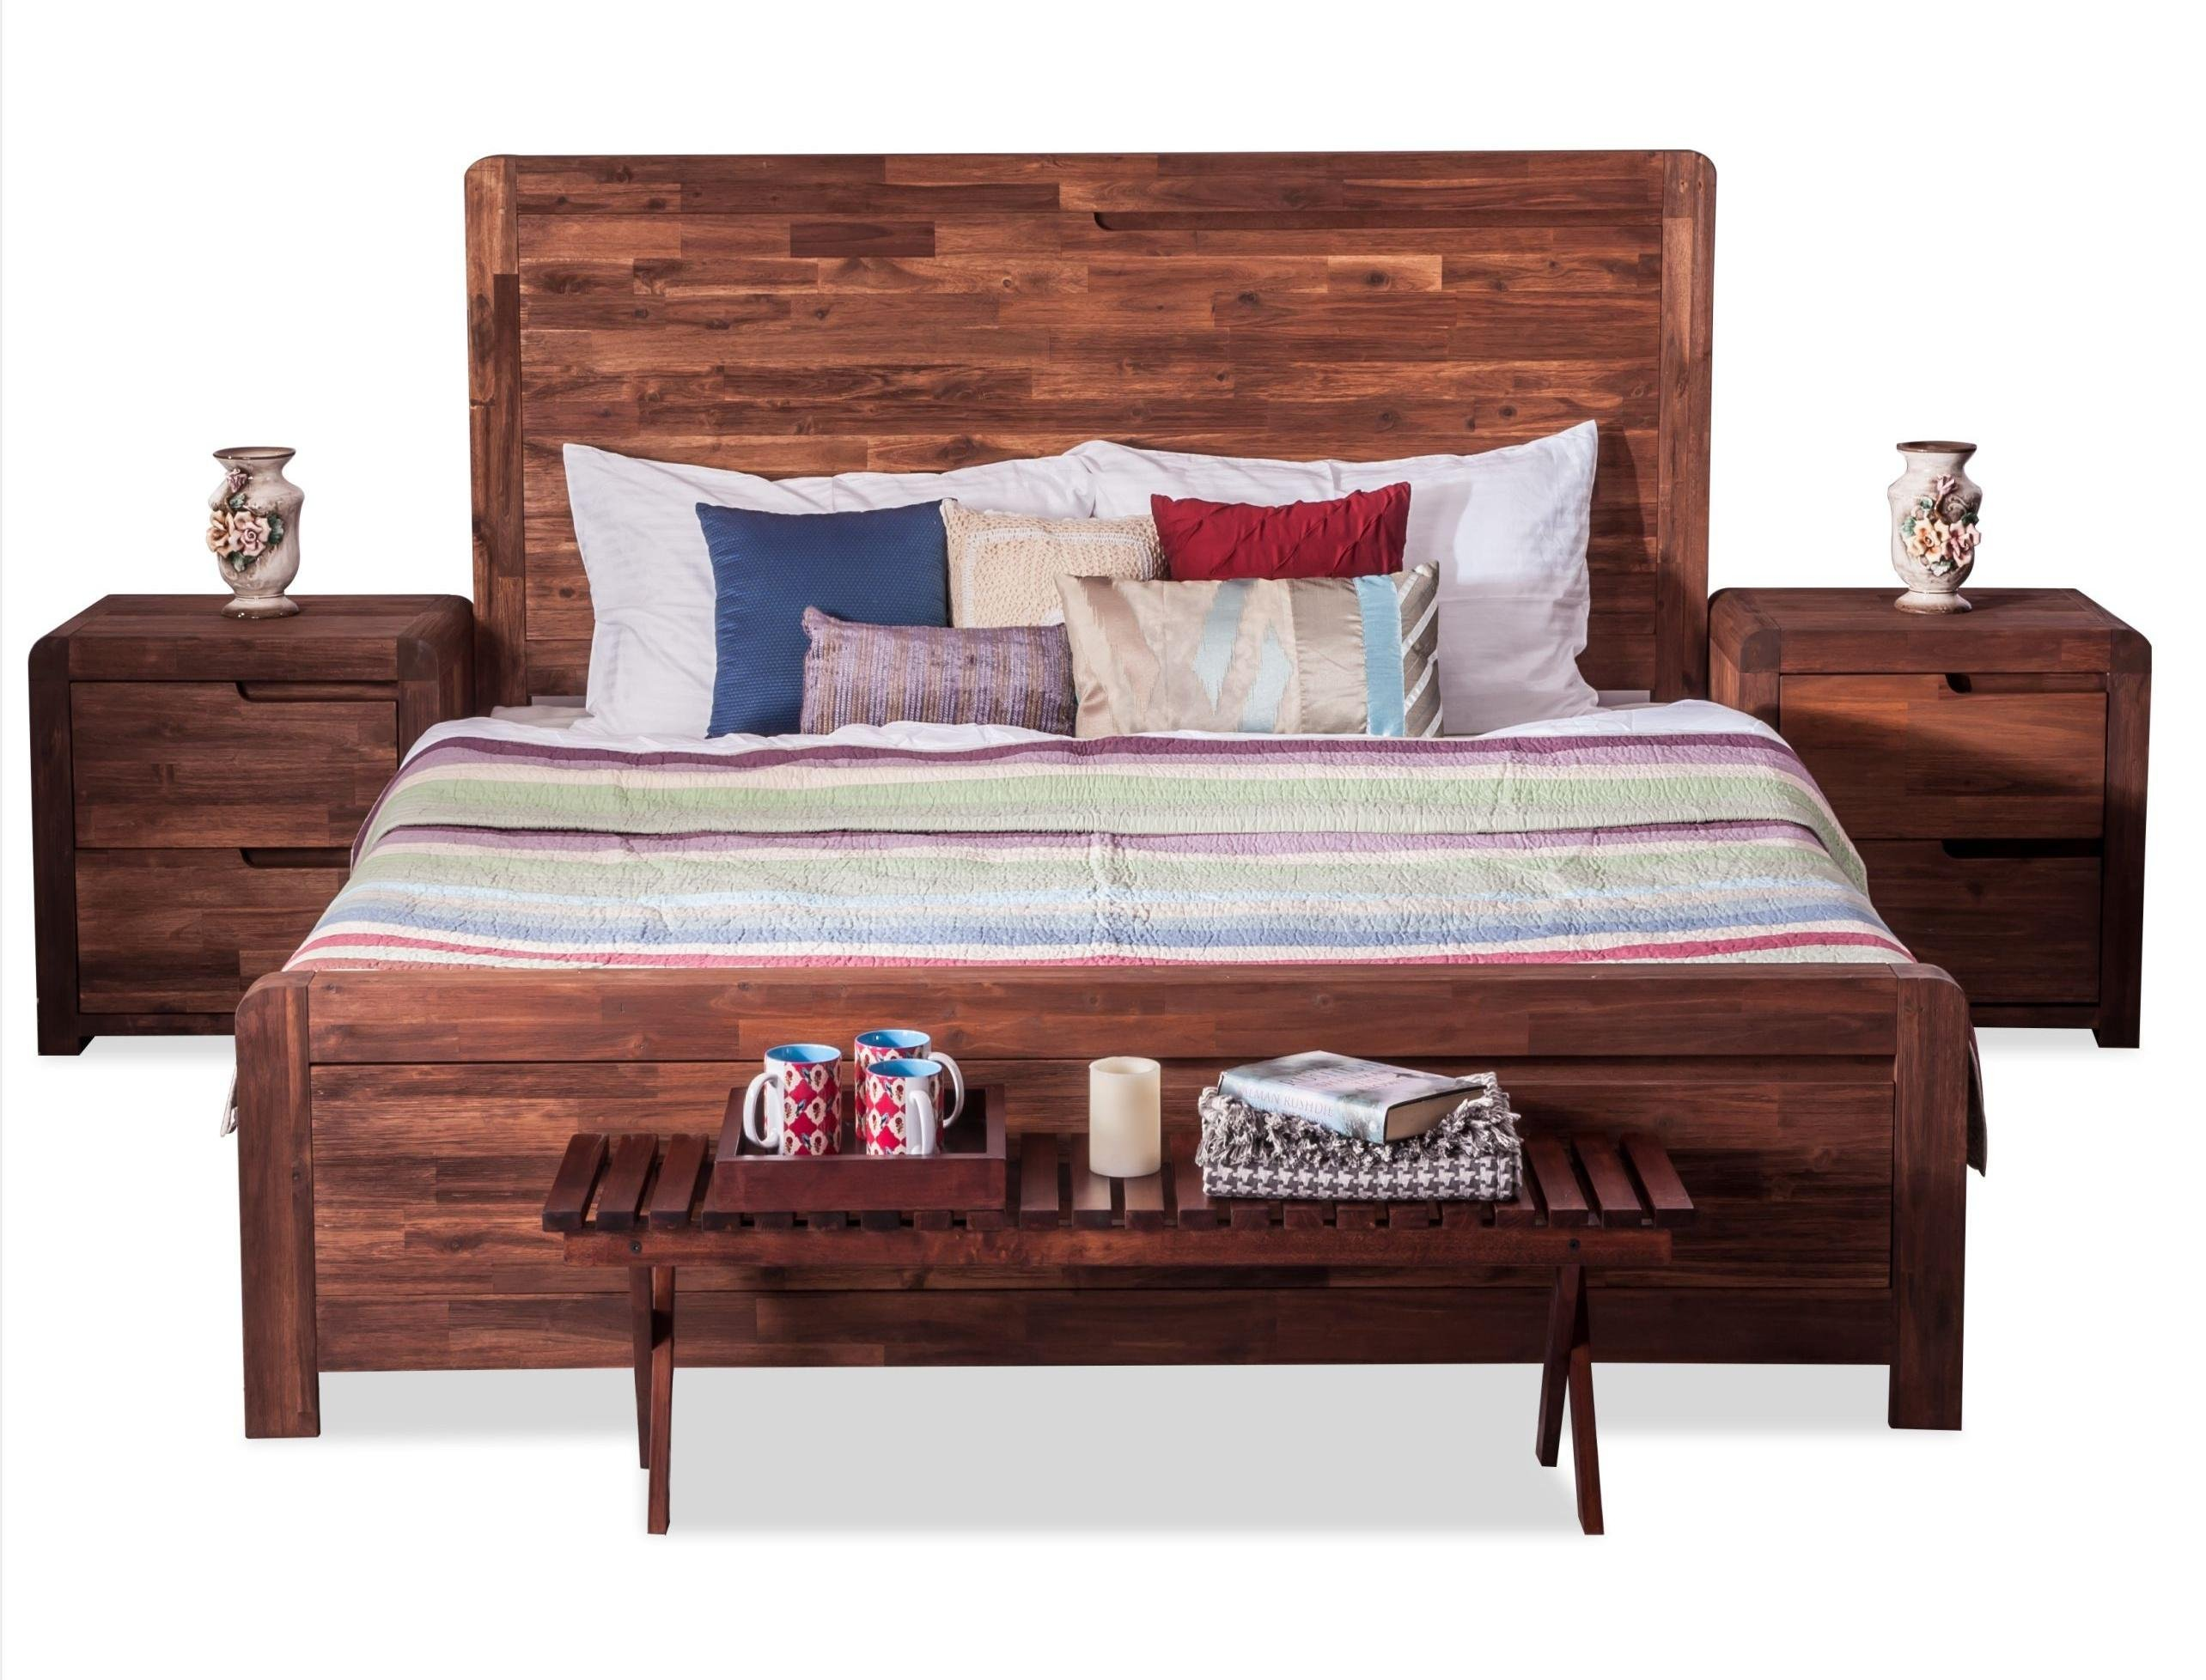 Durian Roman King Size Bed Walnut Amazon Home Amp Kitchen